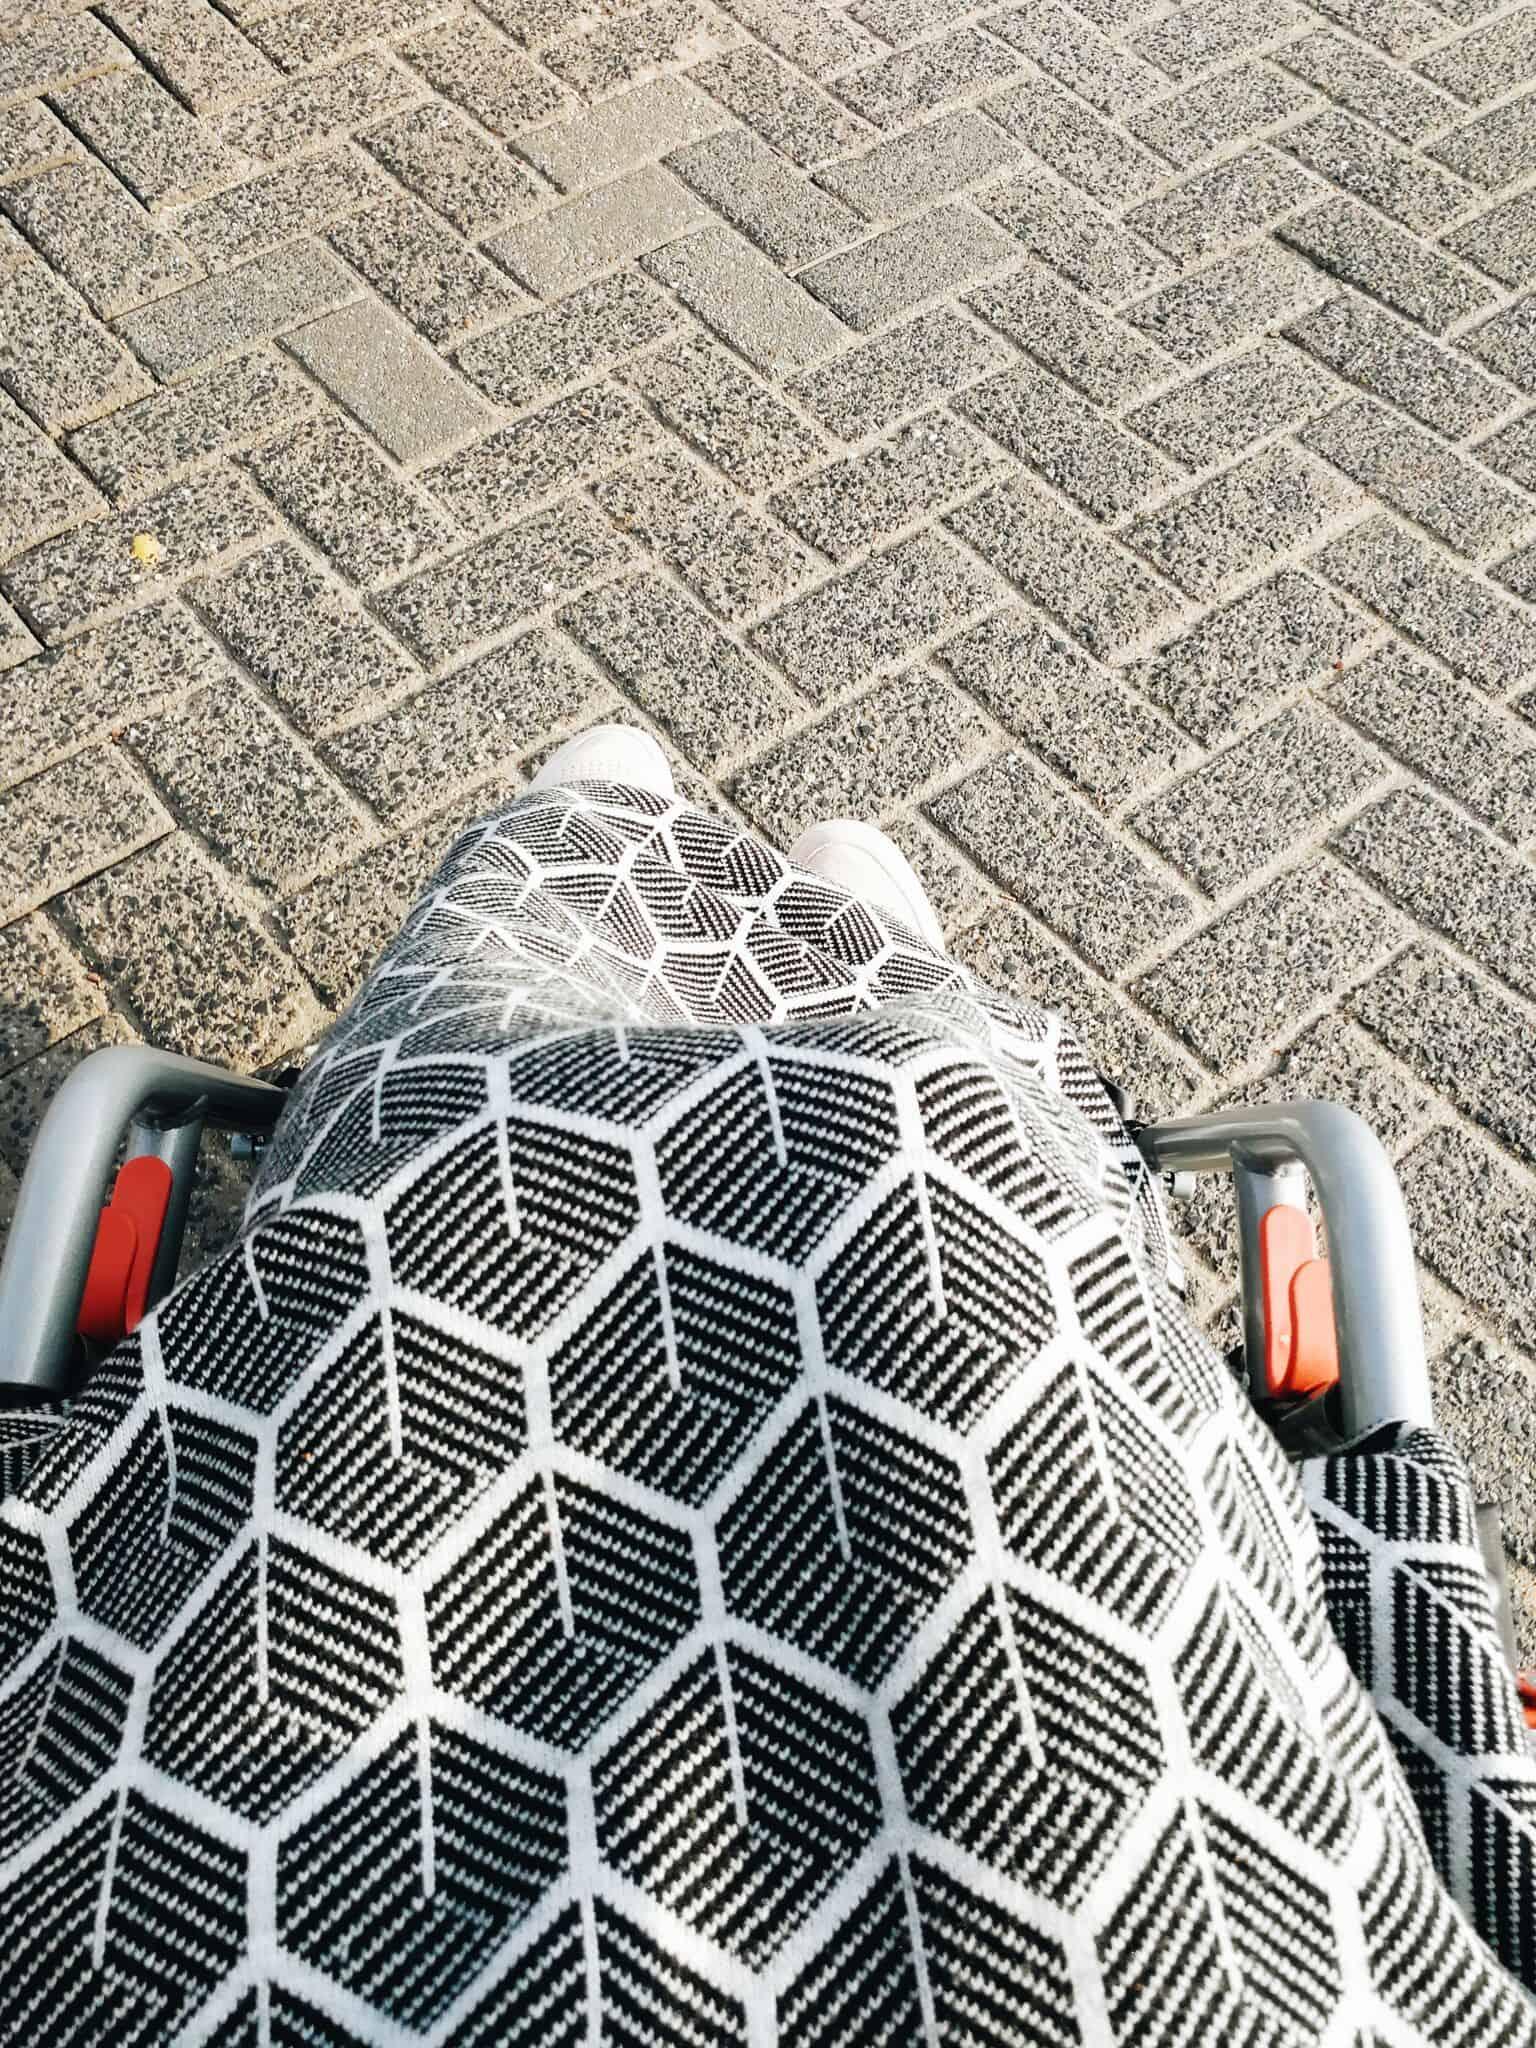 Diary week 12 & 13: vanuit de rolstoel